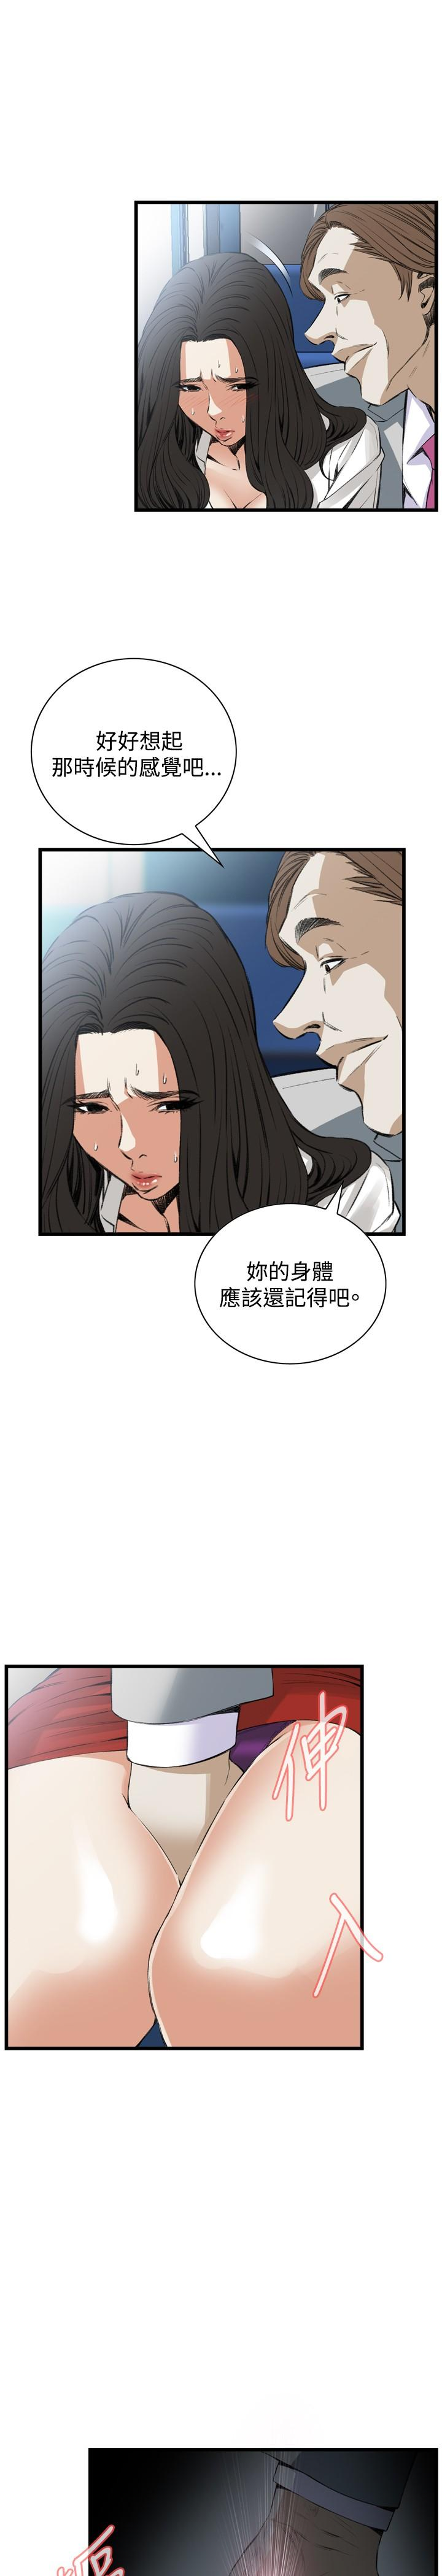 Take a Peek 偷窥 Ch.39~60 [Chinese]中文 322